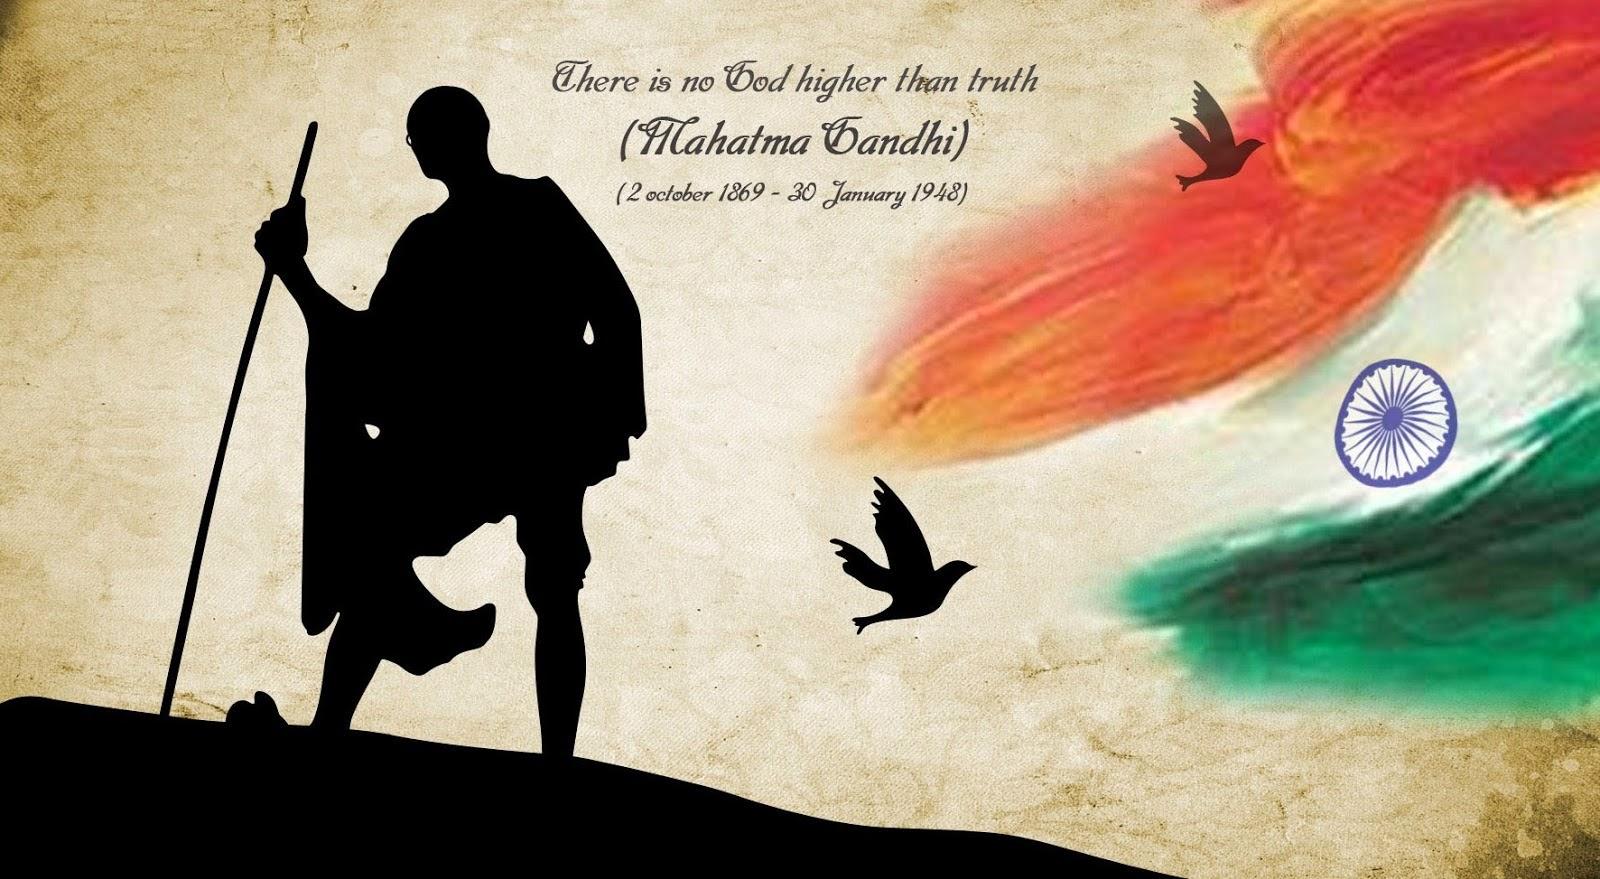 Gandhi Quotes On Love Love Terms Mahatma Gandhi Quotes